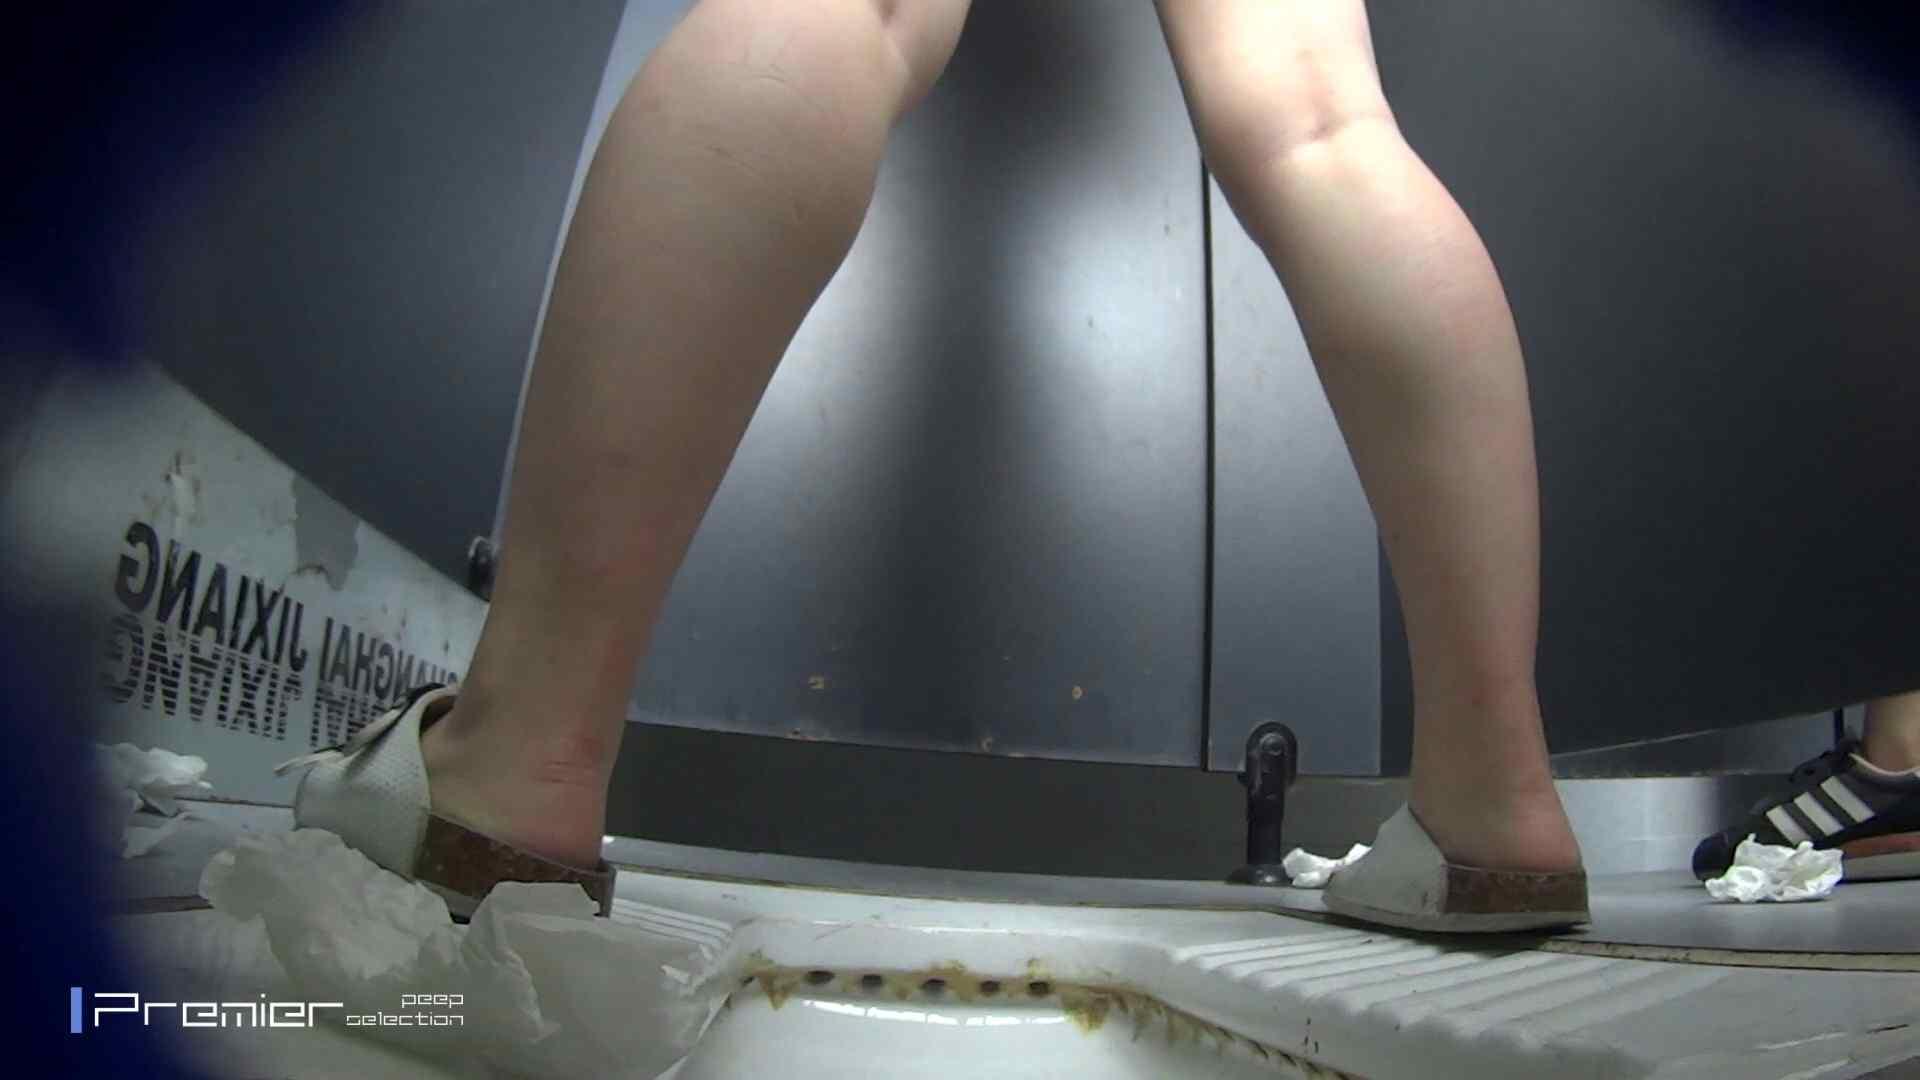 聖水ダラダラ色美女の洗面所 大学休憩時間の洗面所事情55 洗面所  55PIX 12